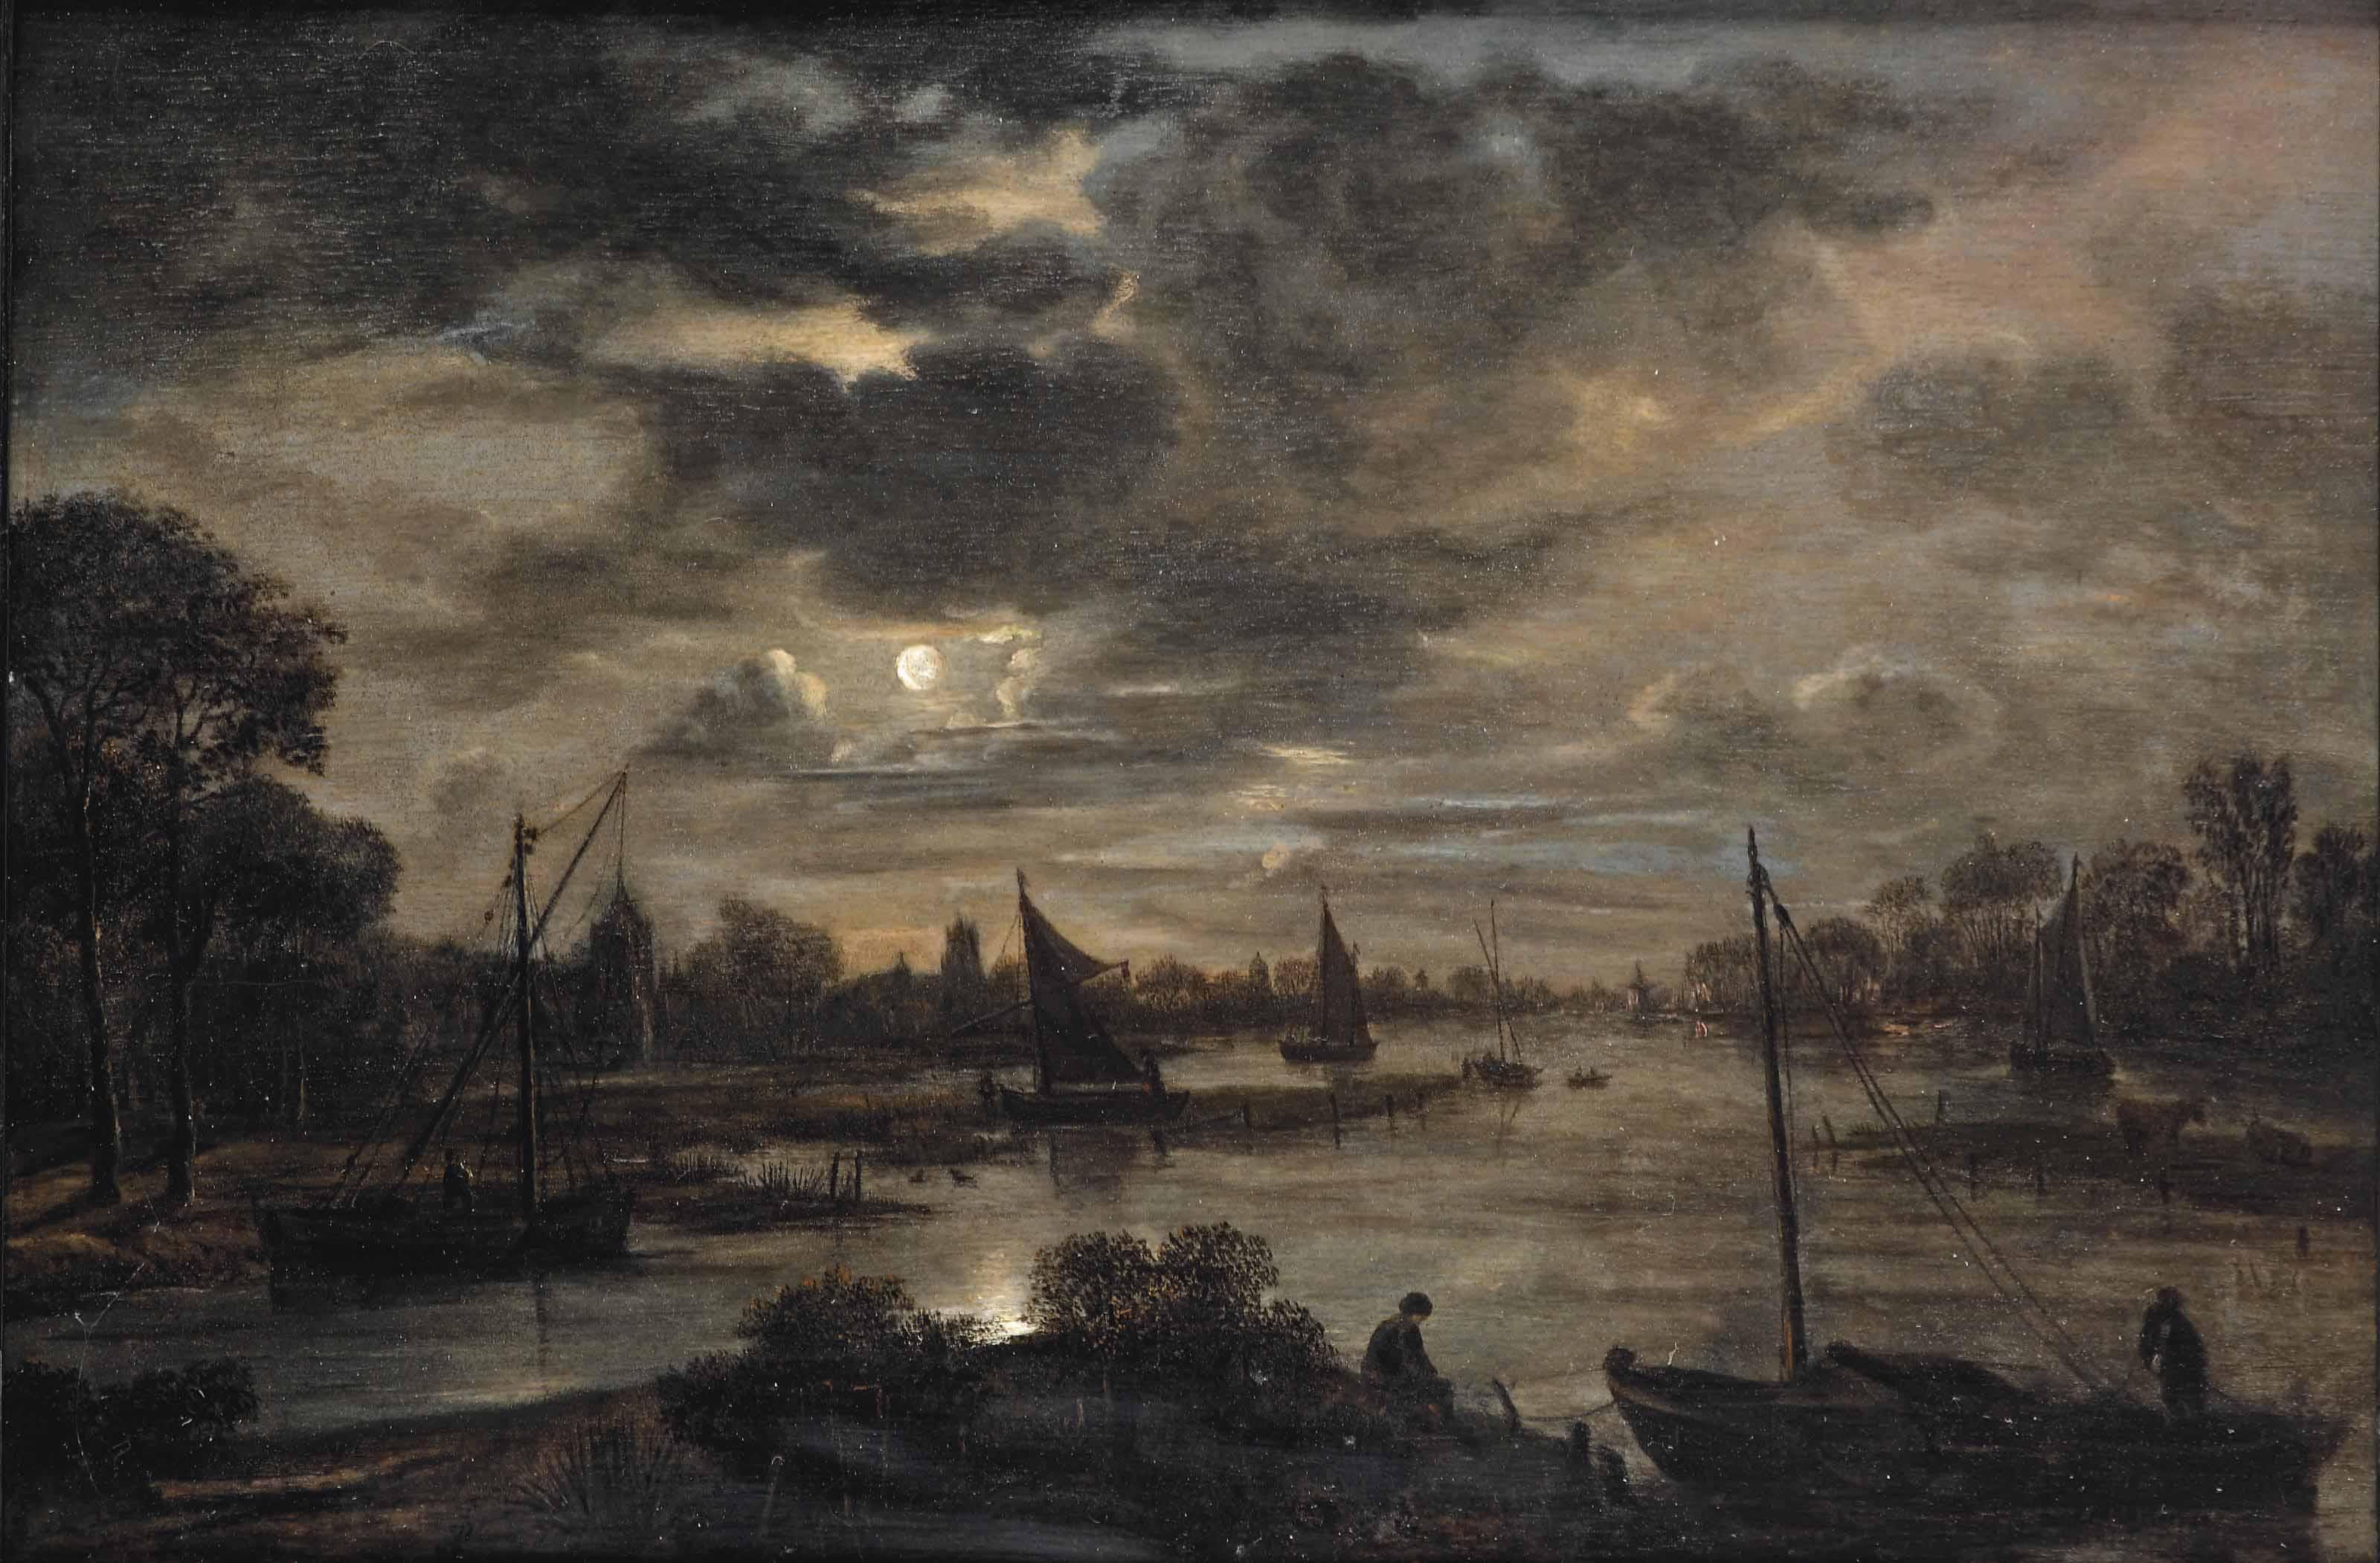 Aert van der Neer (Gorichem 16